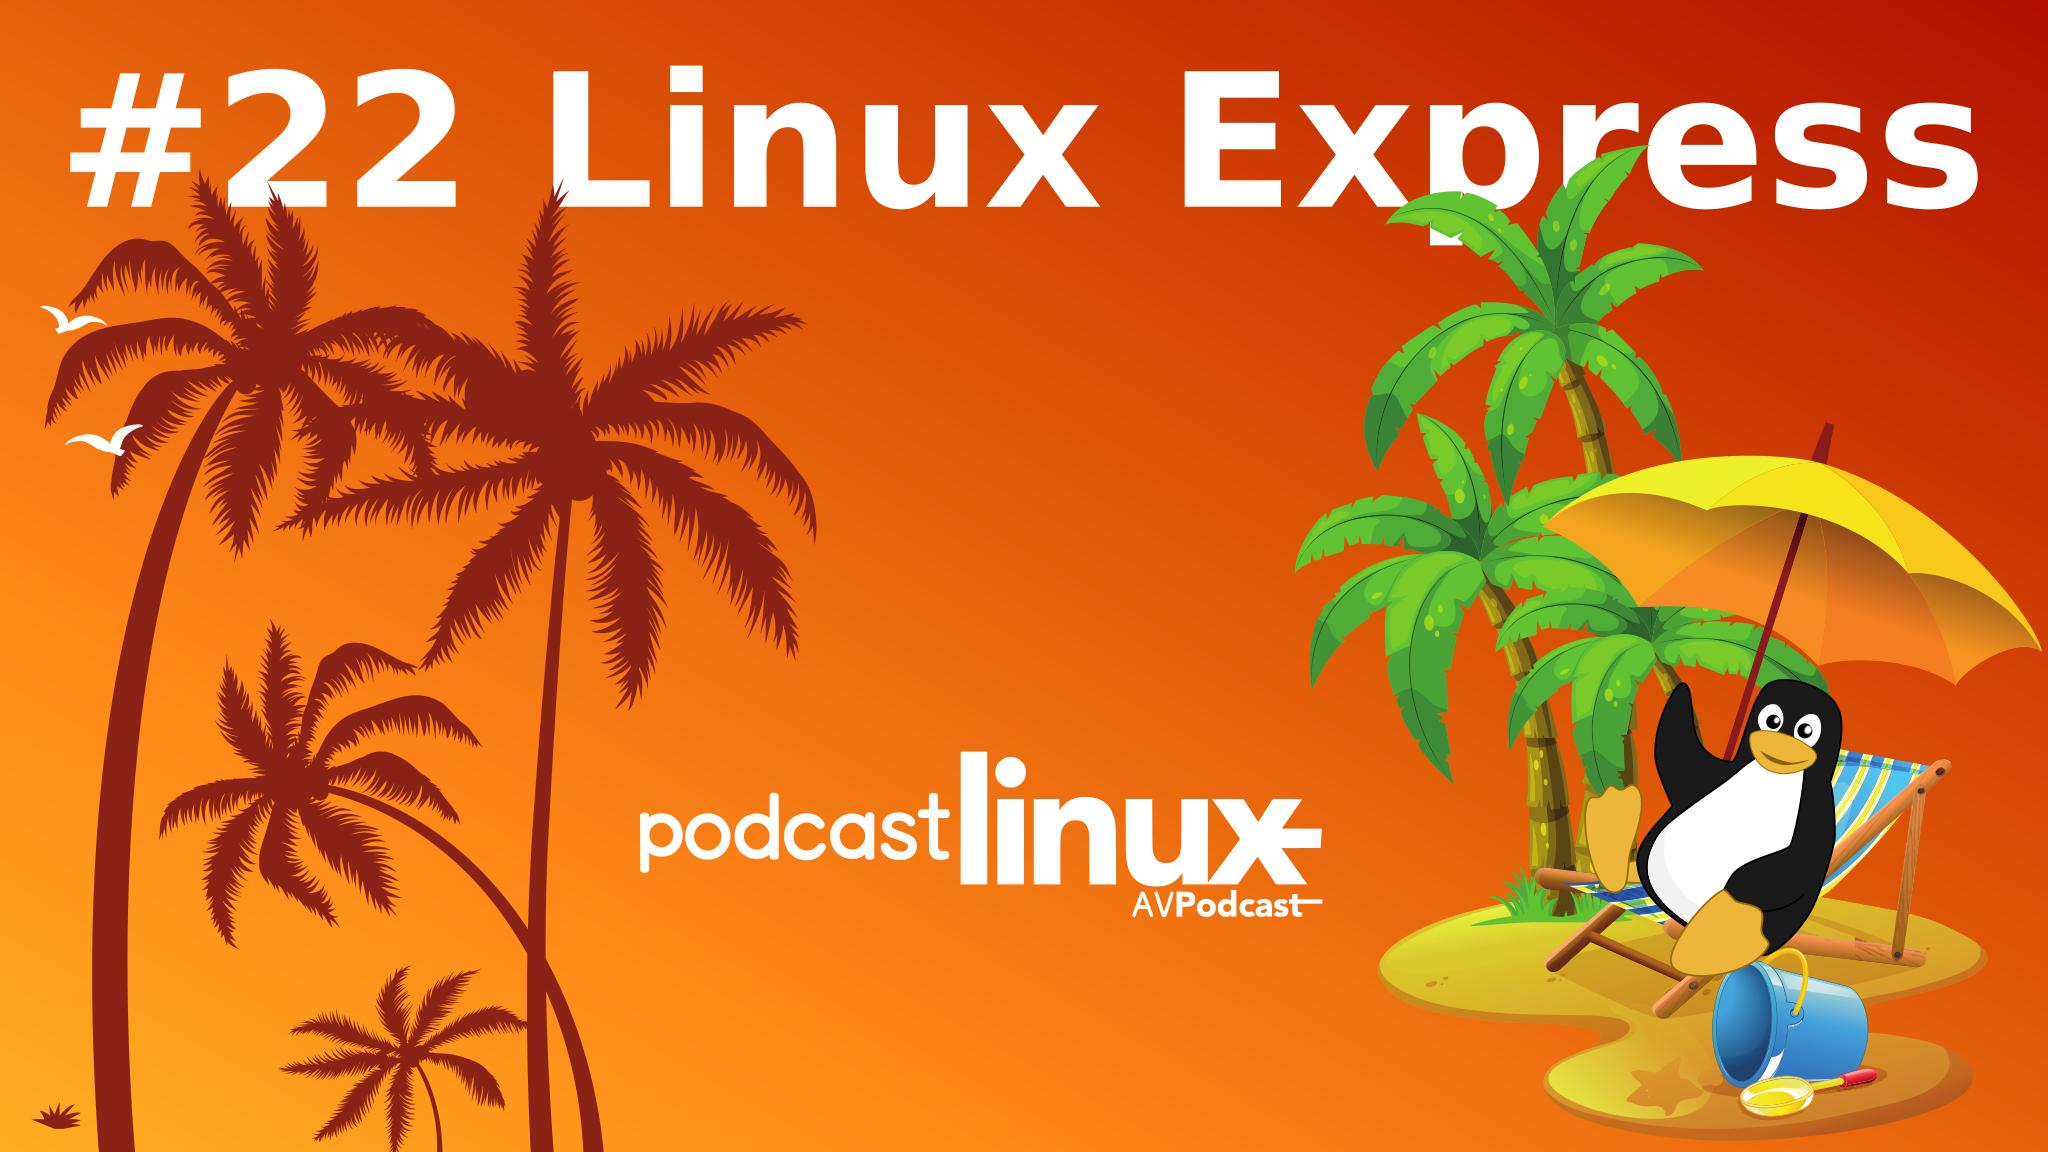 #22 Linux Express